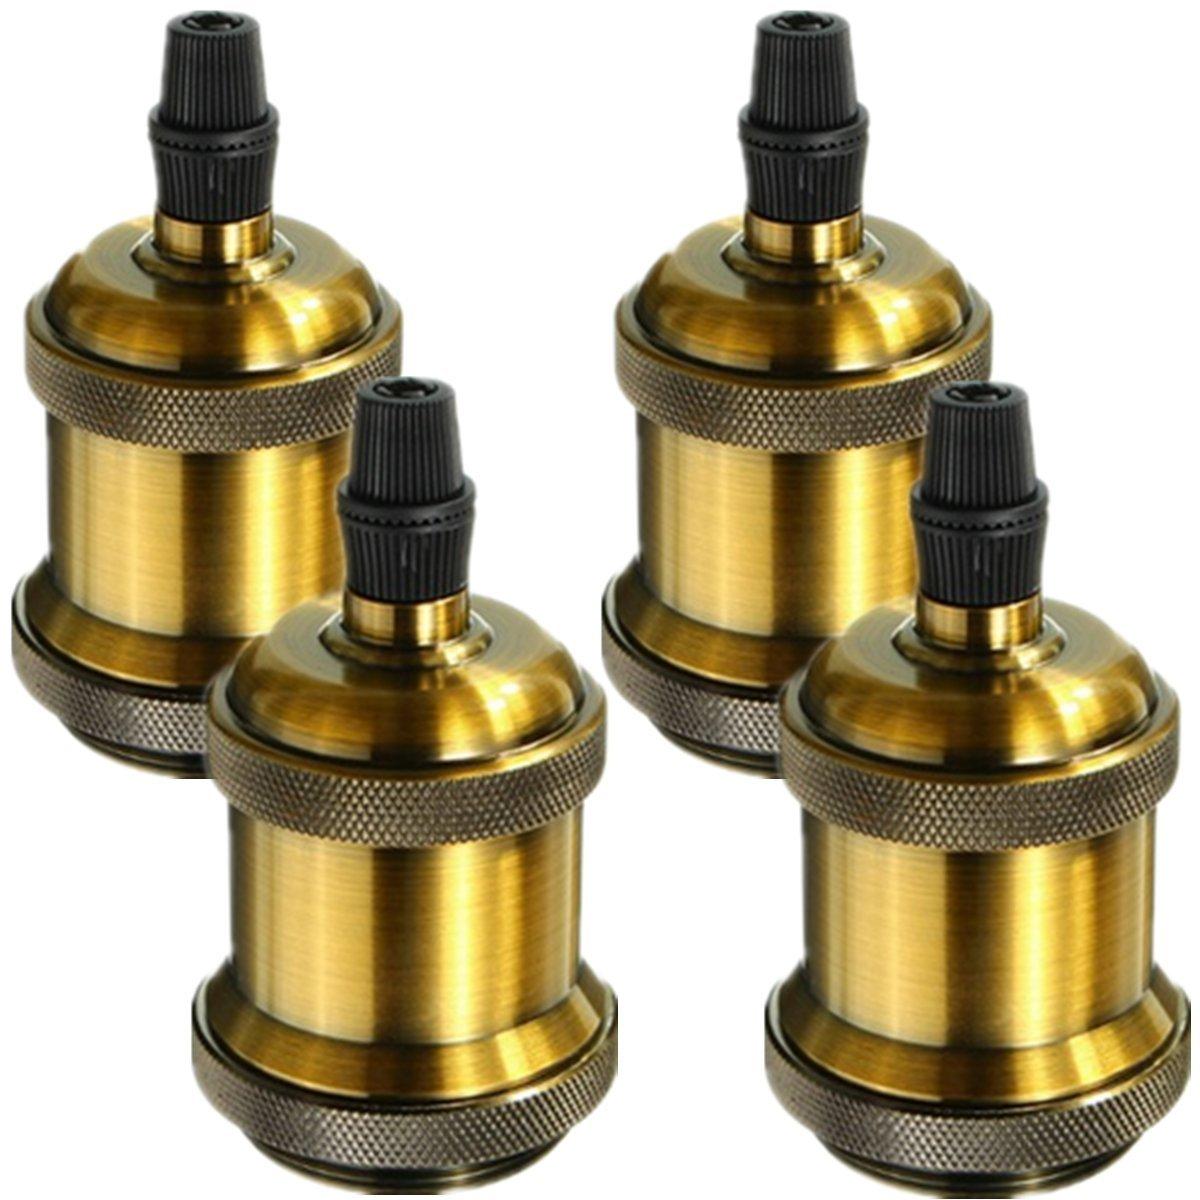 INNOCCY Lamp Socket, Solid Vintage Industrial Edison Pendant Ceramics Medium E26 Light Socket Brass Finished, 4 Pack